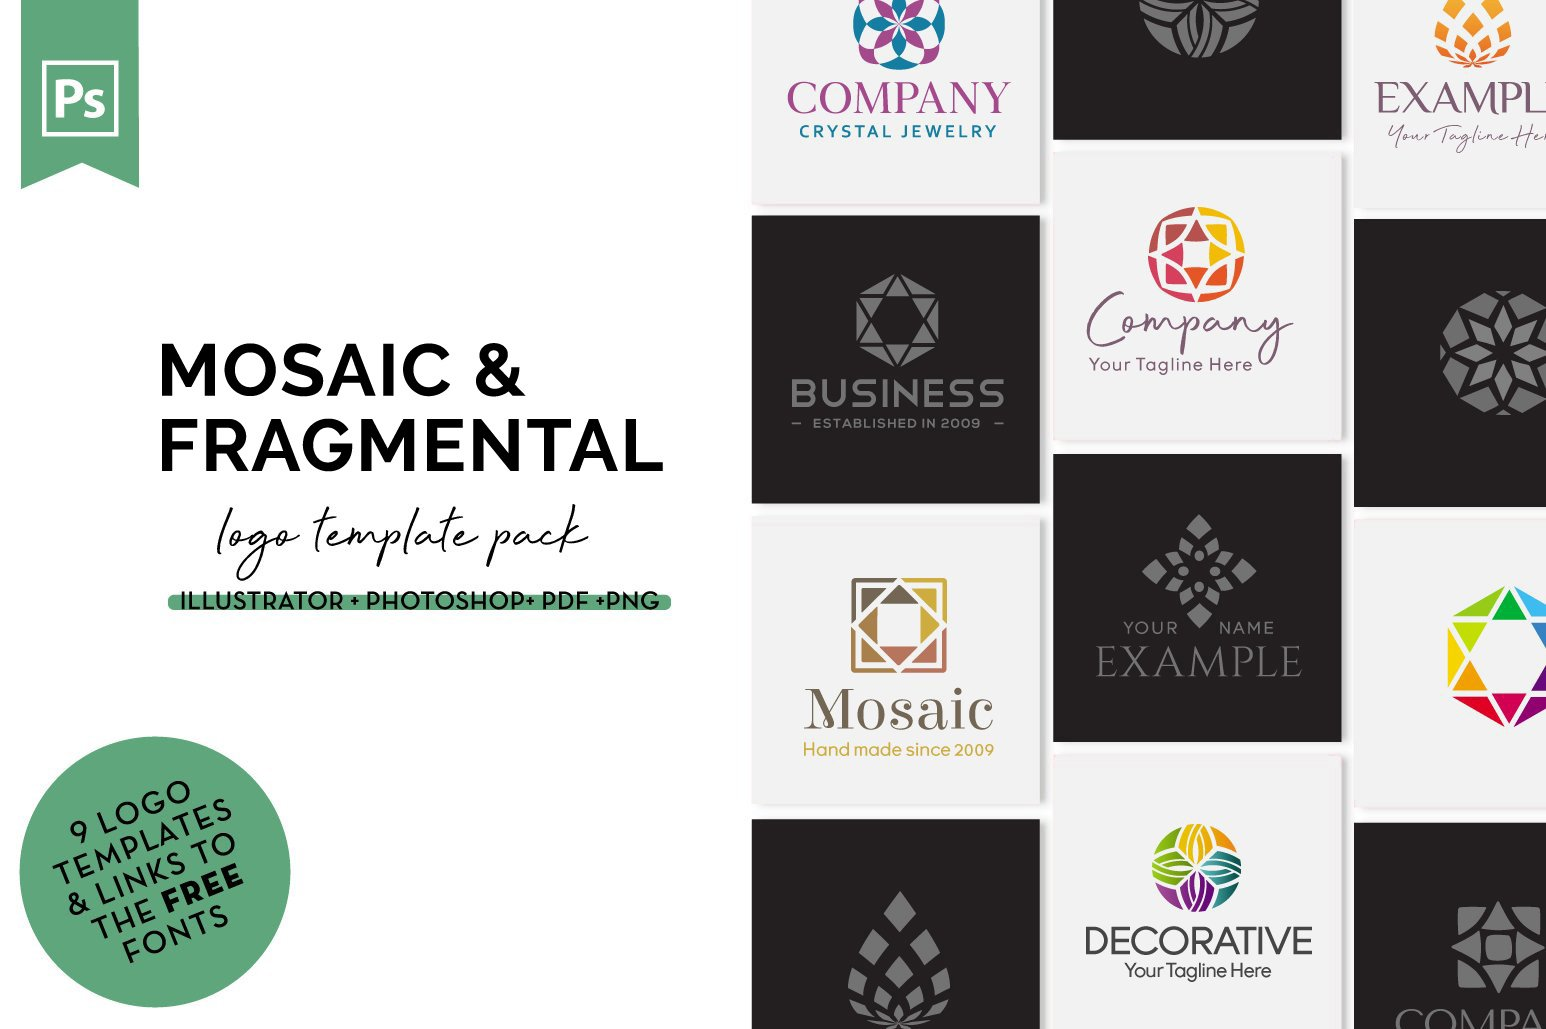 Mosaic & Fragmental Logo Design Set example image 1